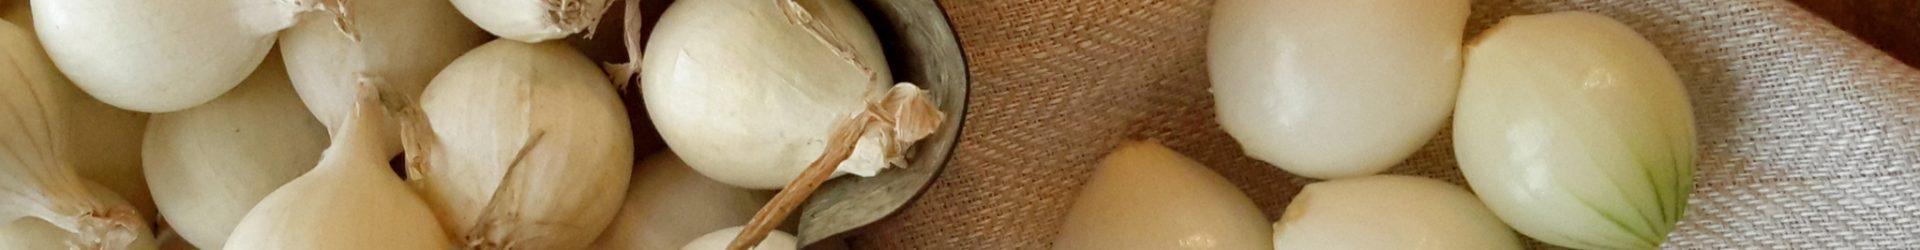 Zoete balsamico uien (cipolline in agrodolce)